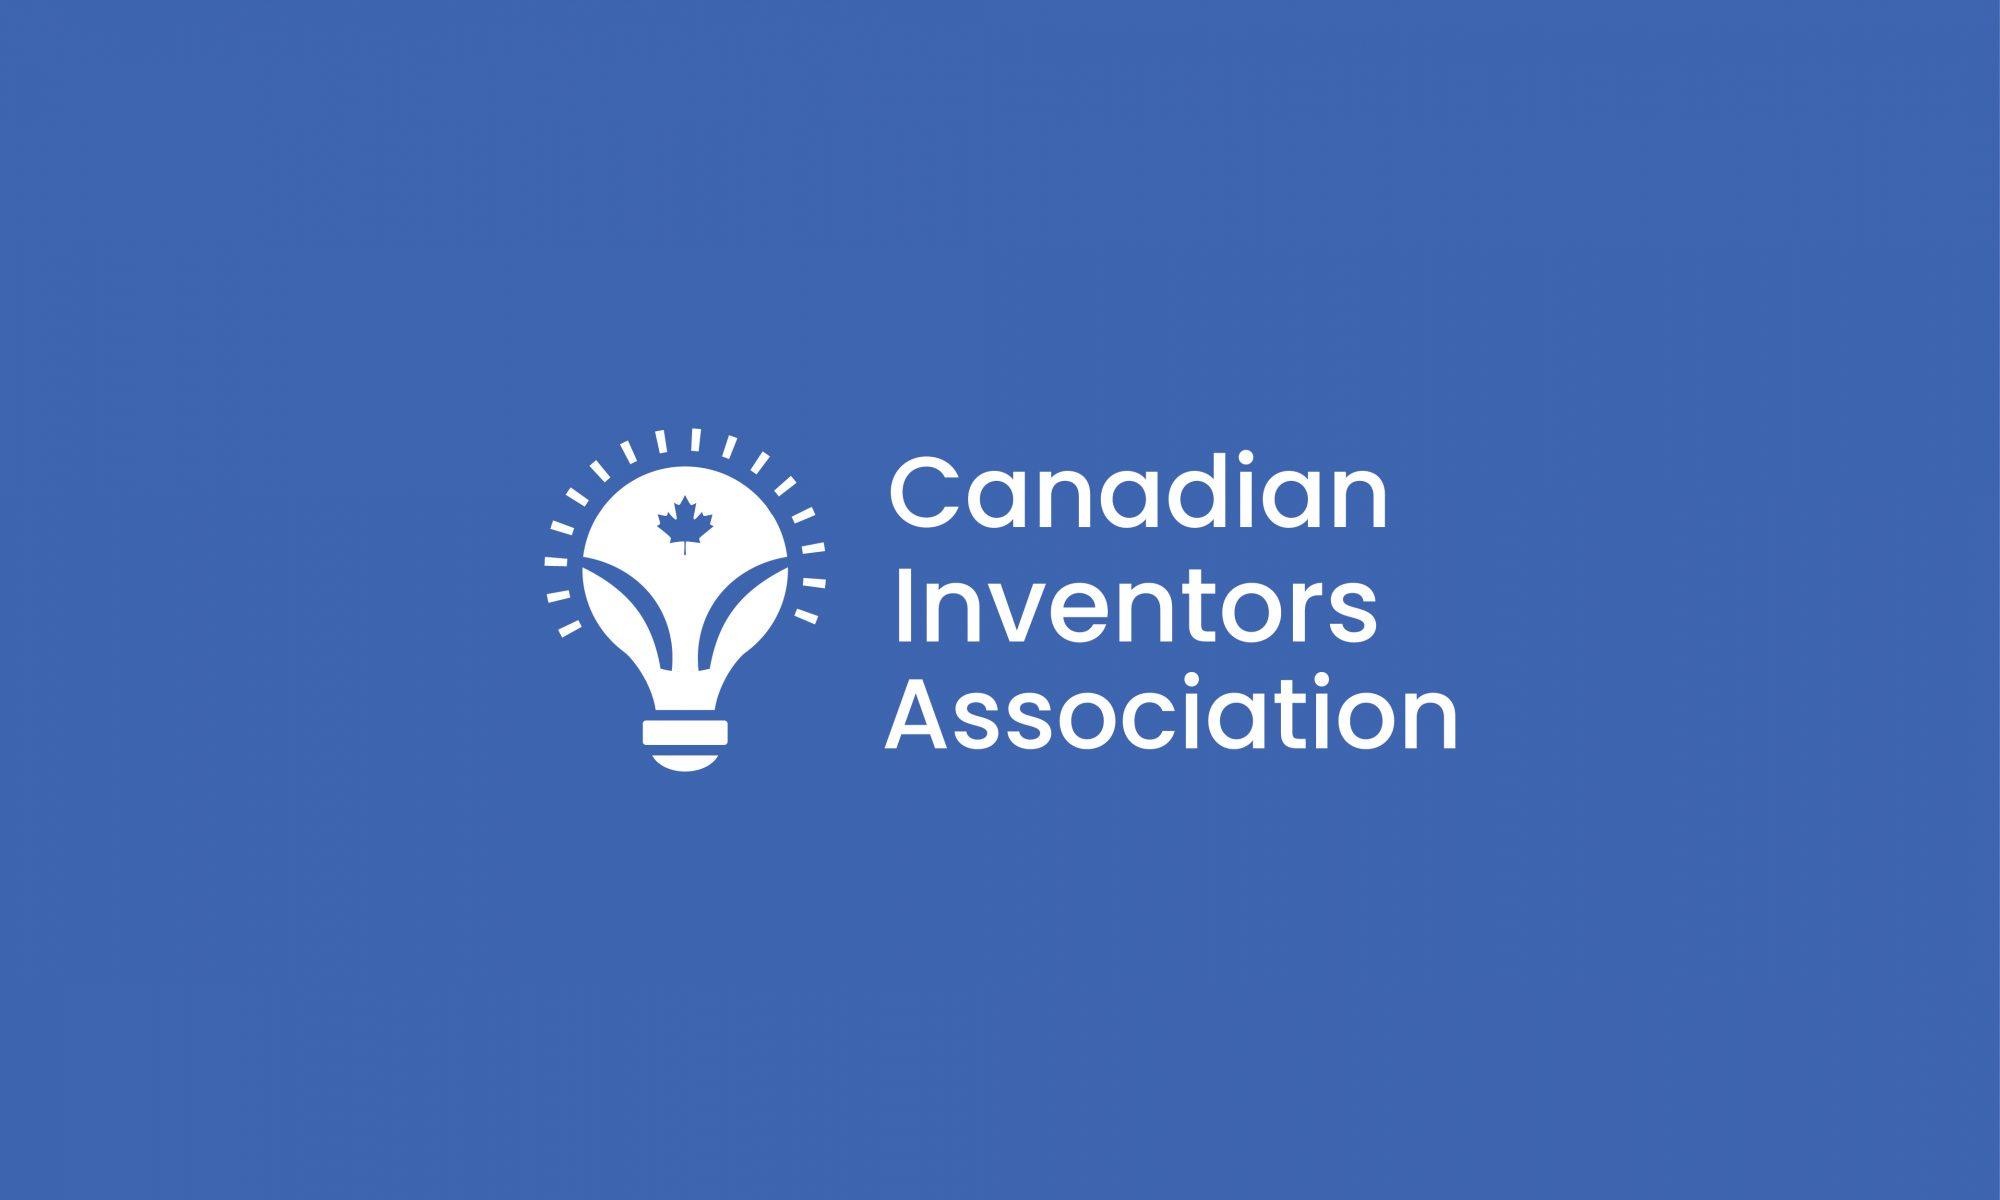 Canadian Inventors Association